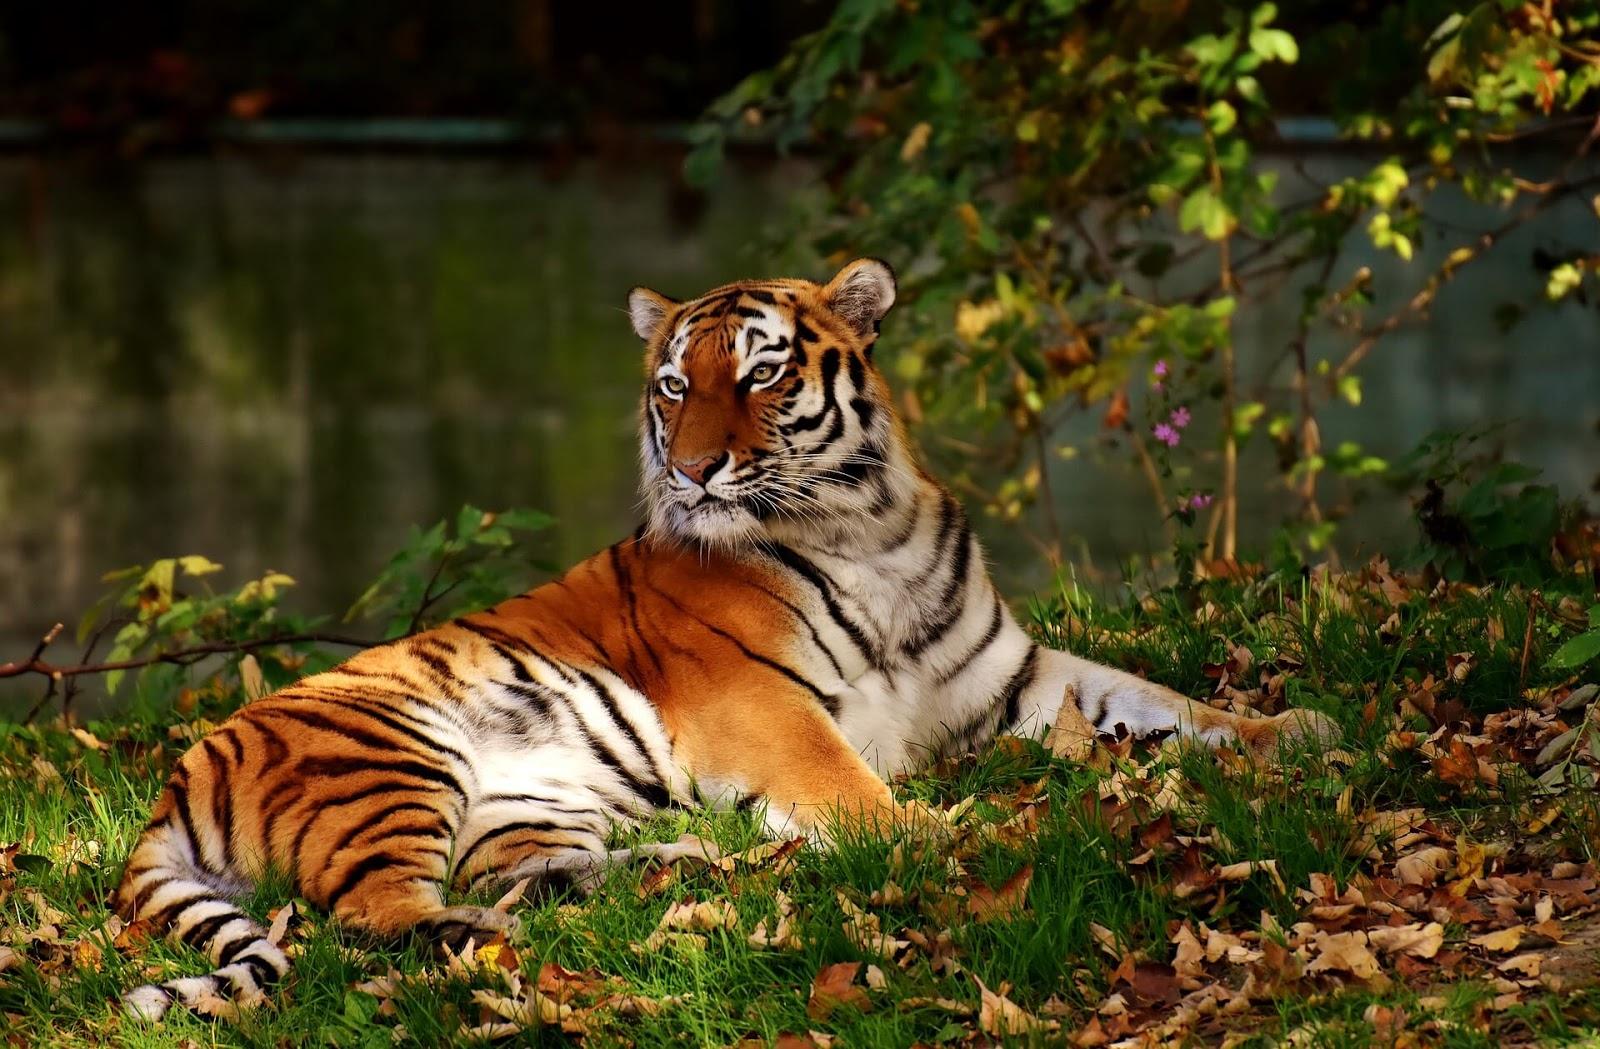 tiger wallpaper free download